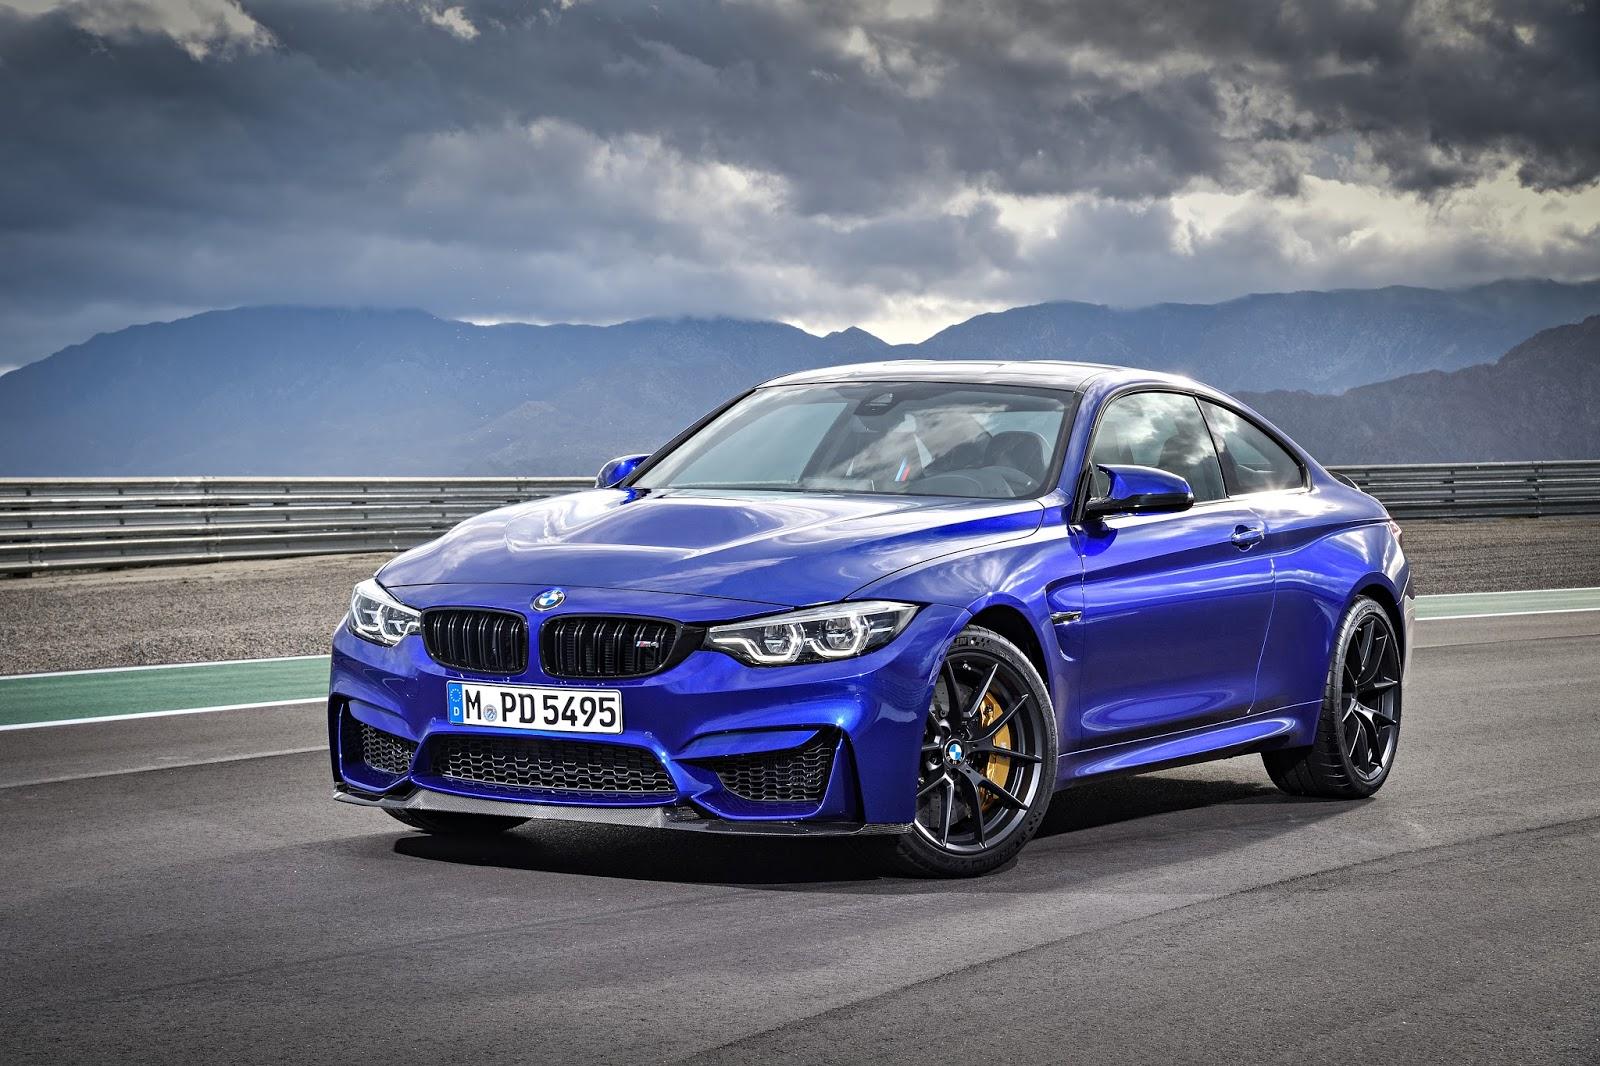 P90251019 highRes the new bmw m4 cs 04 1 Η περιορισμένης παραγωγής BMW M4 ClubSport δική σας με 116.900 ευρώ